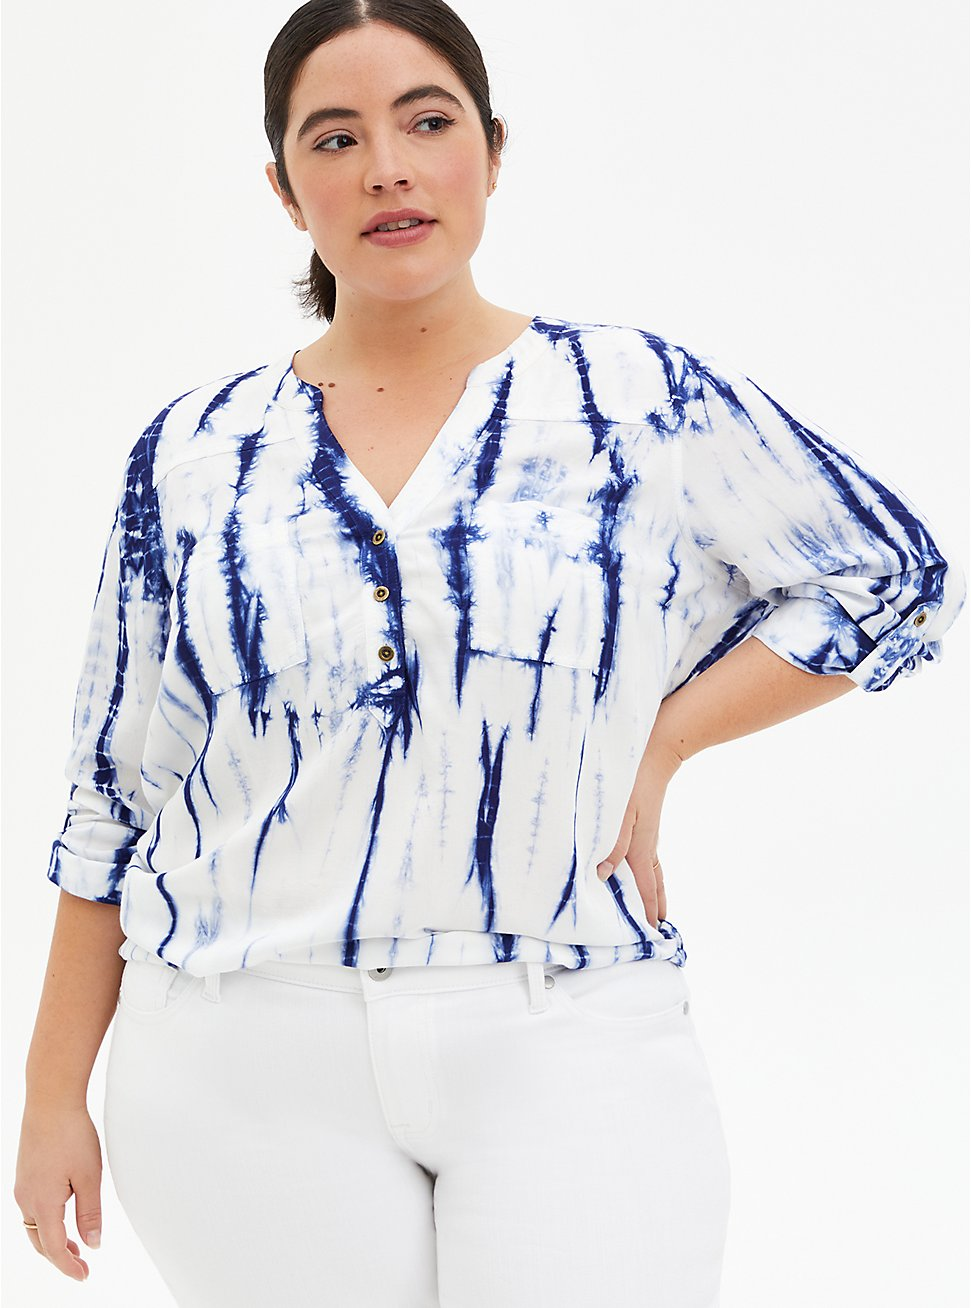 Harper - Blue Ikat Tie-Dye Pullover Blouse, TIE DYE-BLUE, hi-res